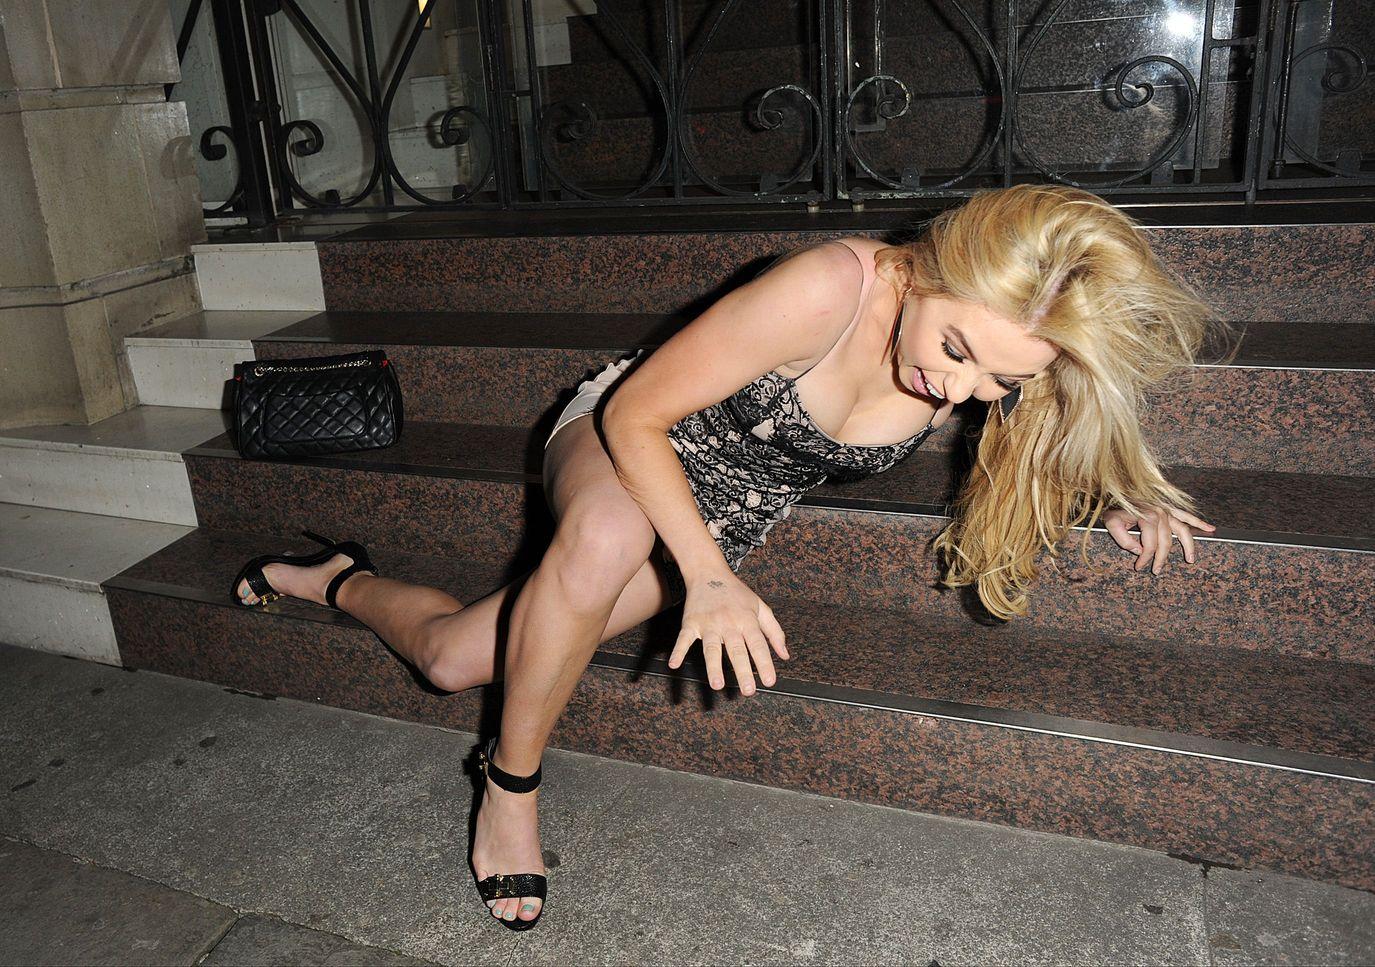 Melissa-Reeves-Nipple-Slip-Ass-12